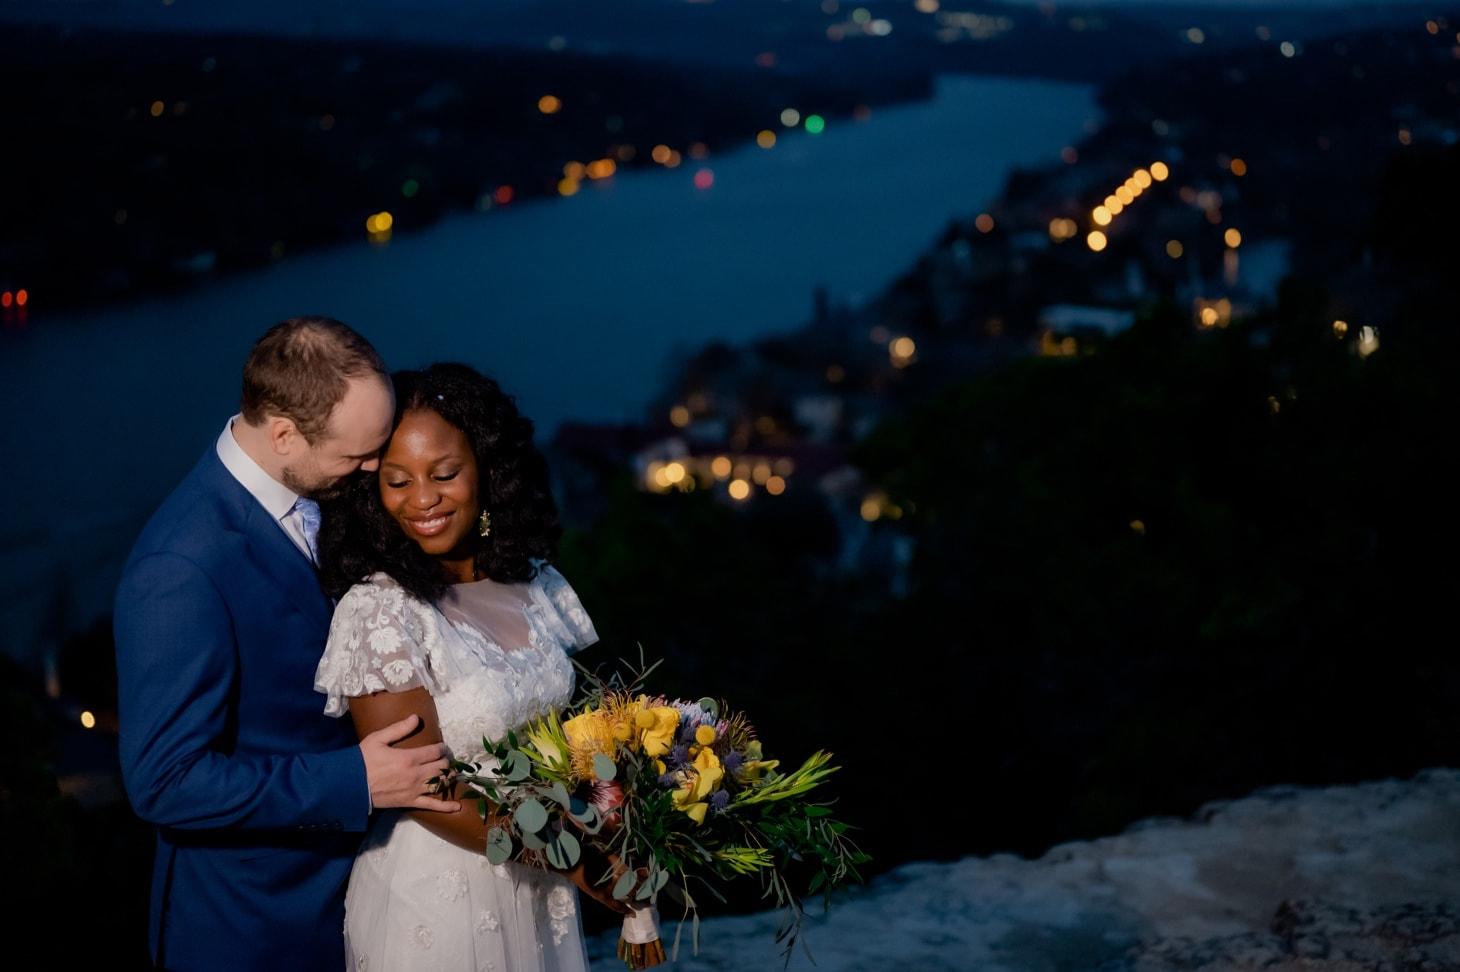 Mount Bonnell at night wedding